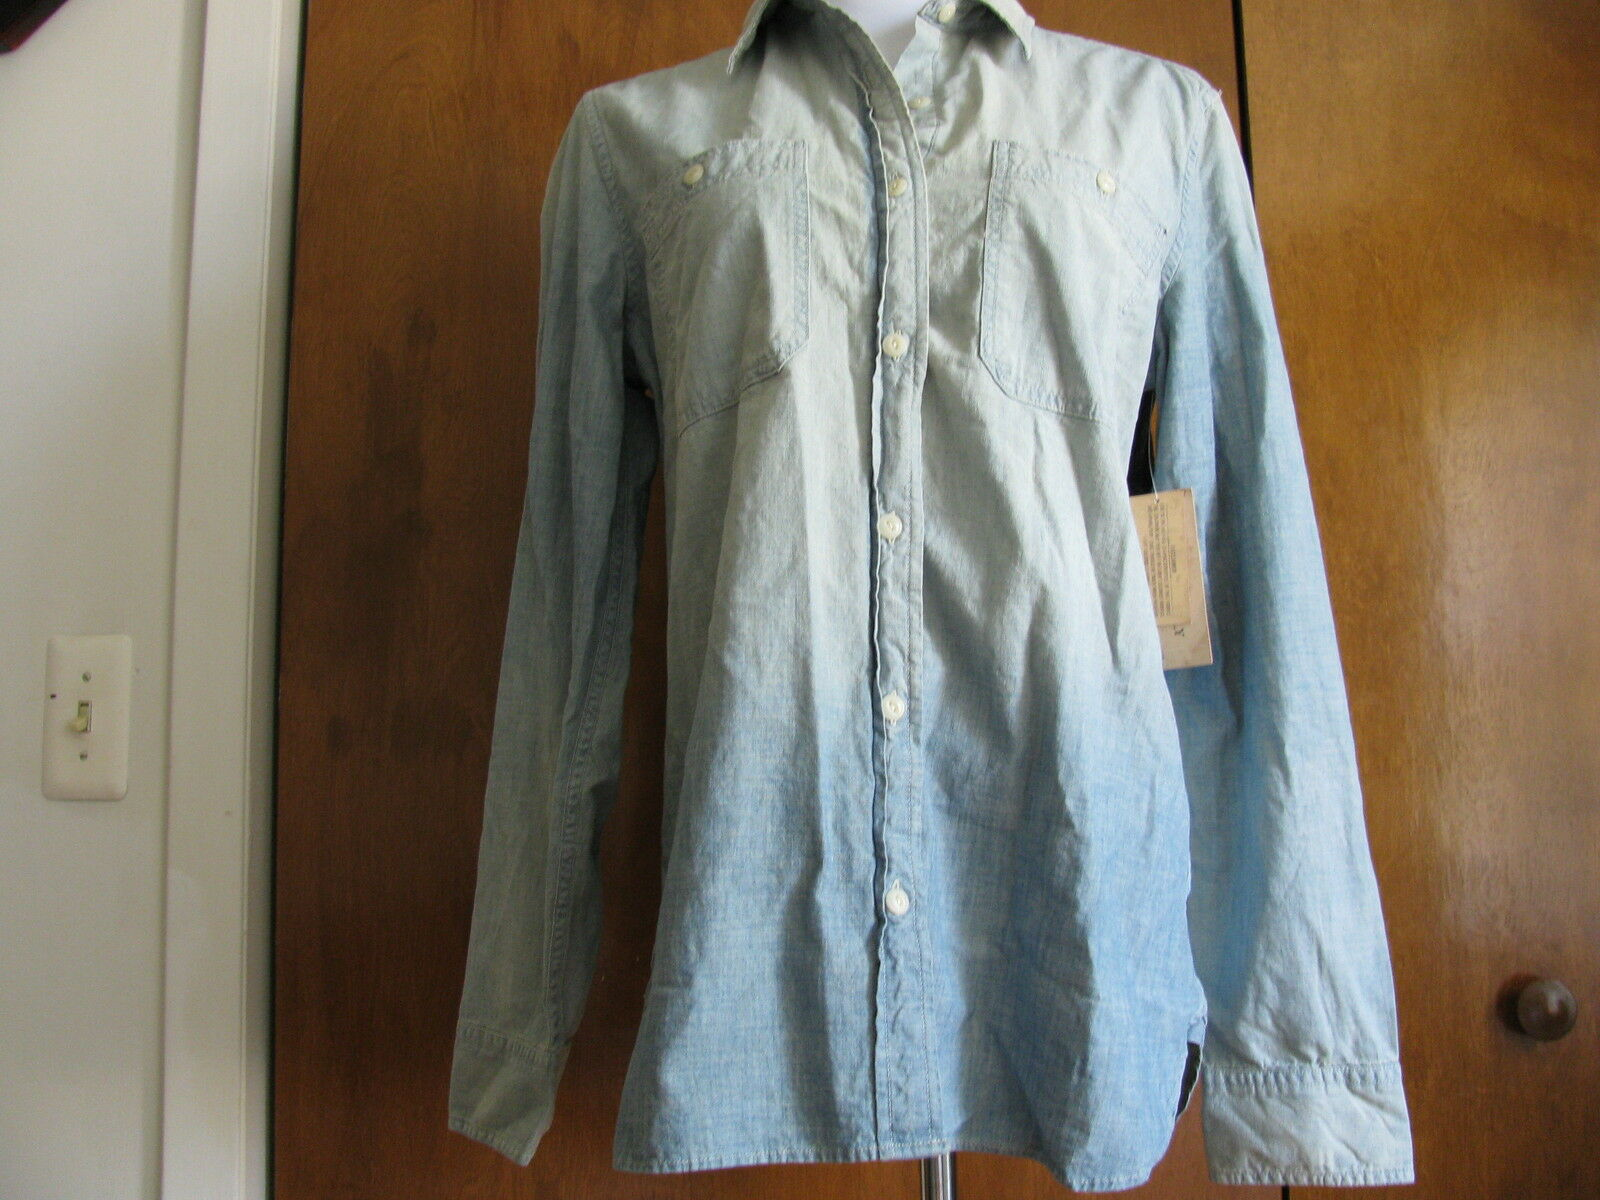 Ralph Laure Denim & Supply damen's jean shirt Größe Small NWT